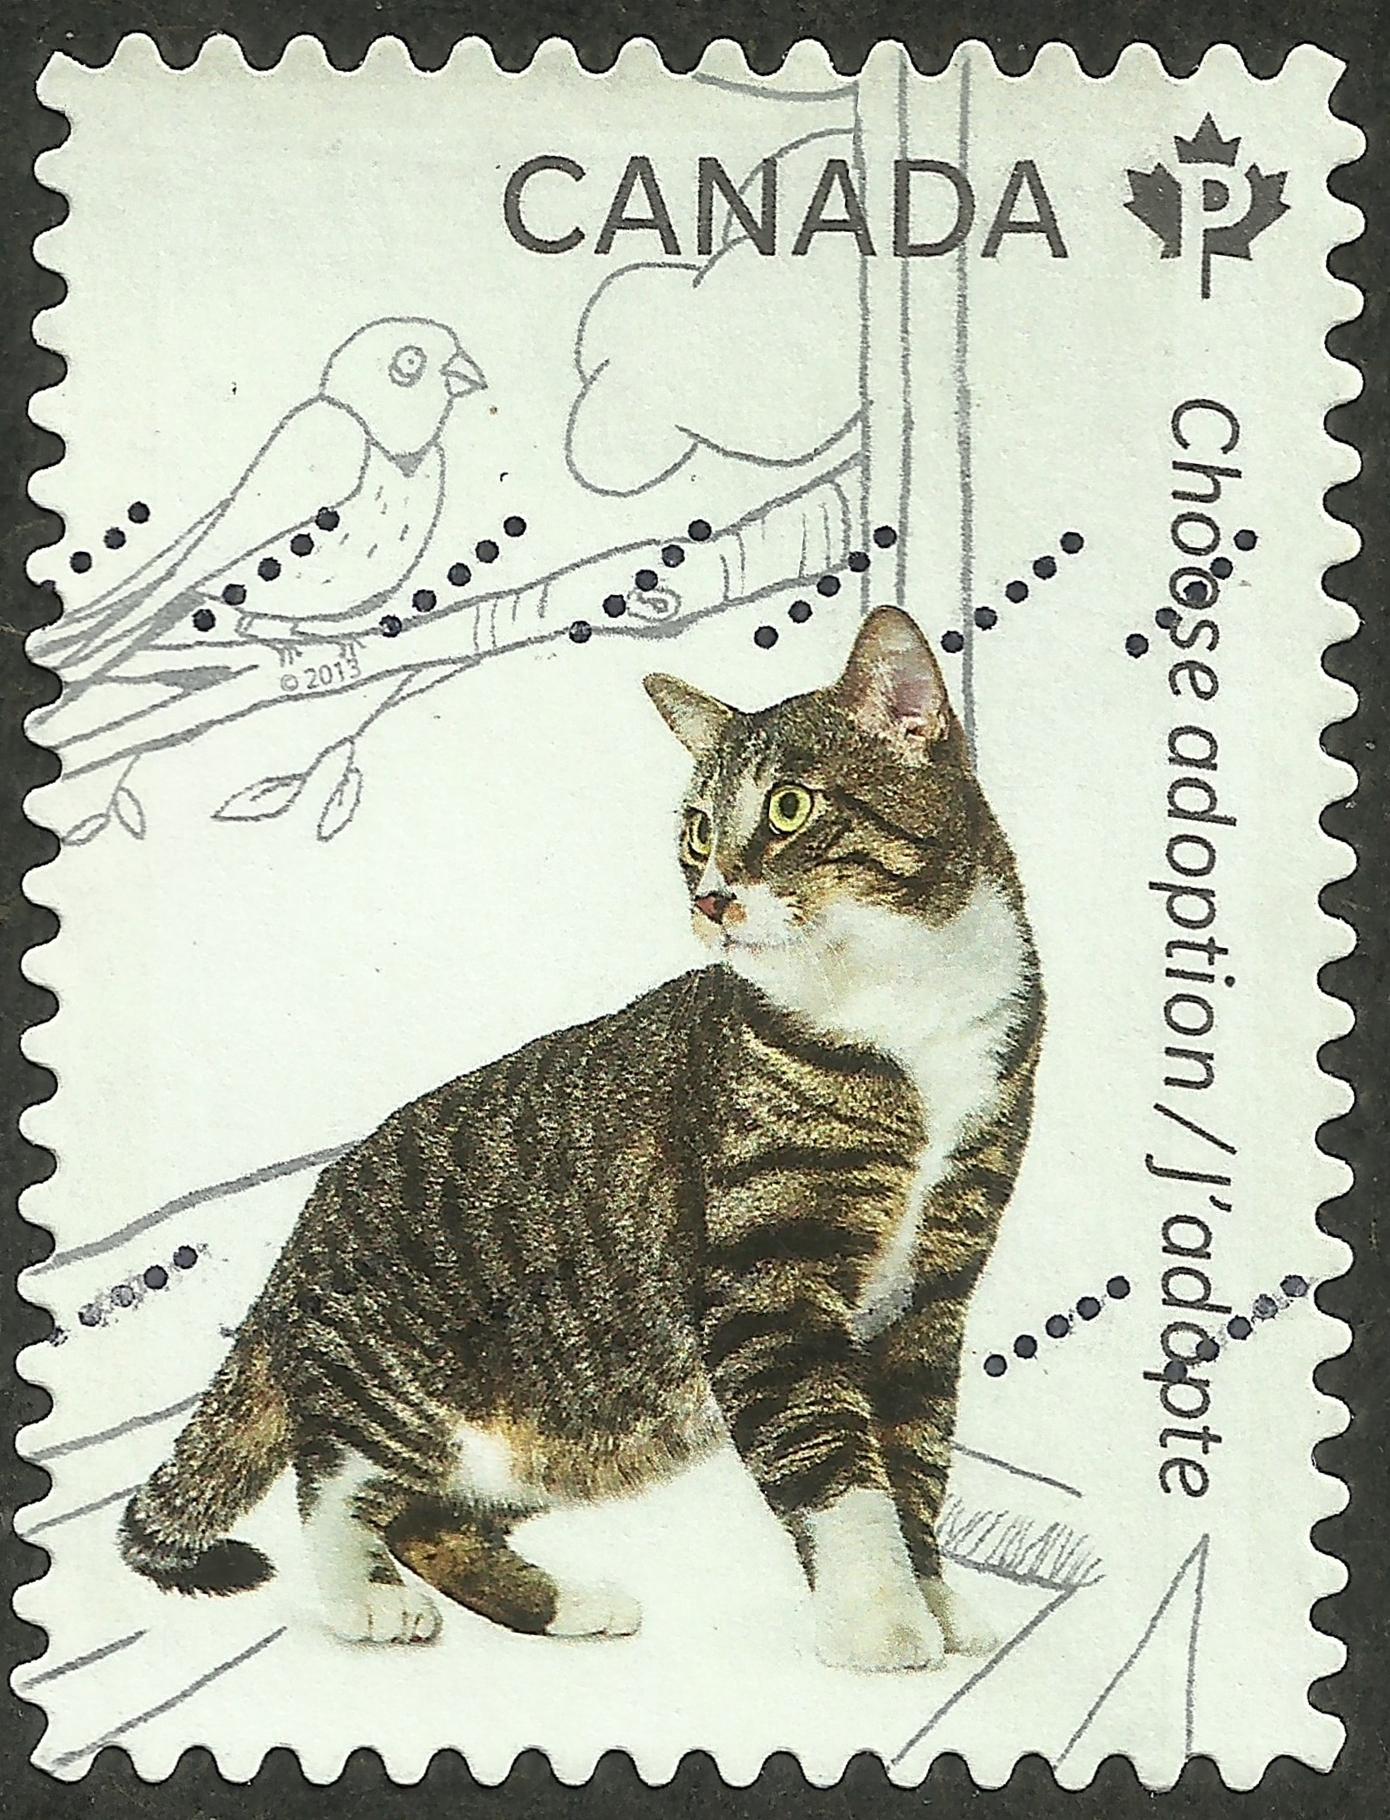 Canada - Scott #2637 (2013)